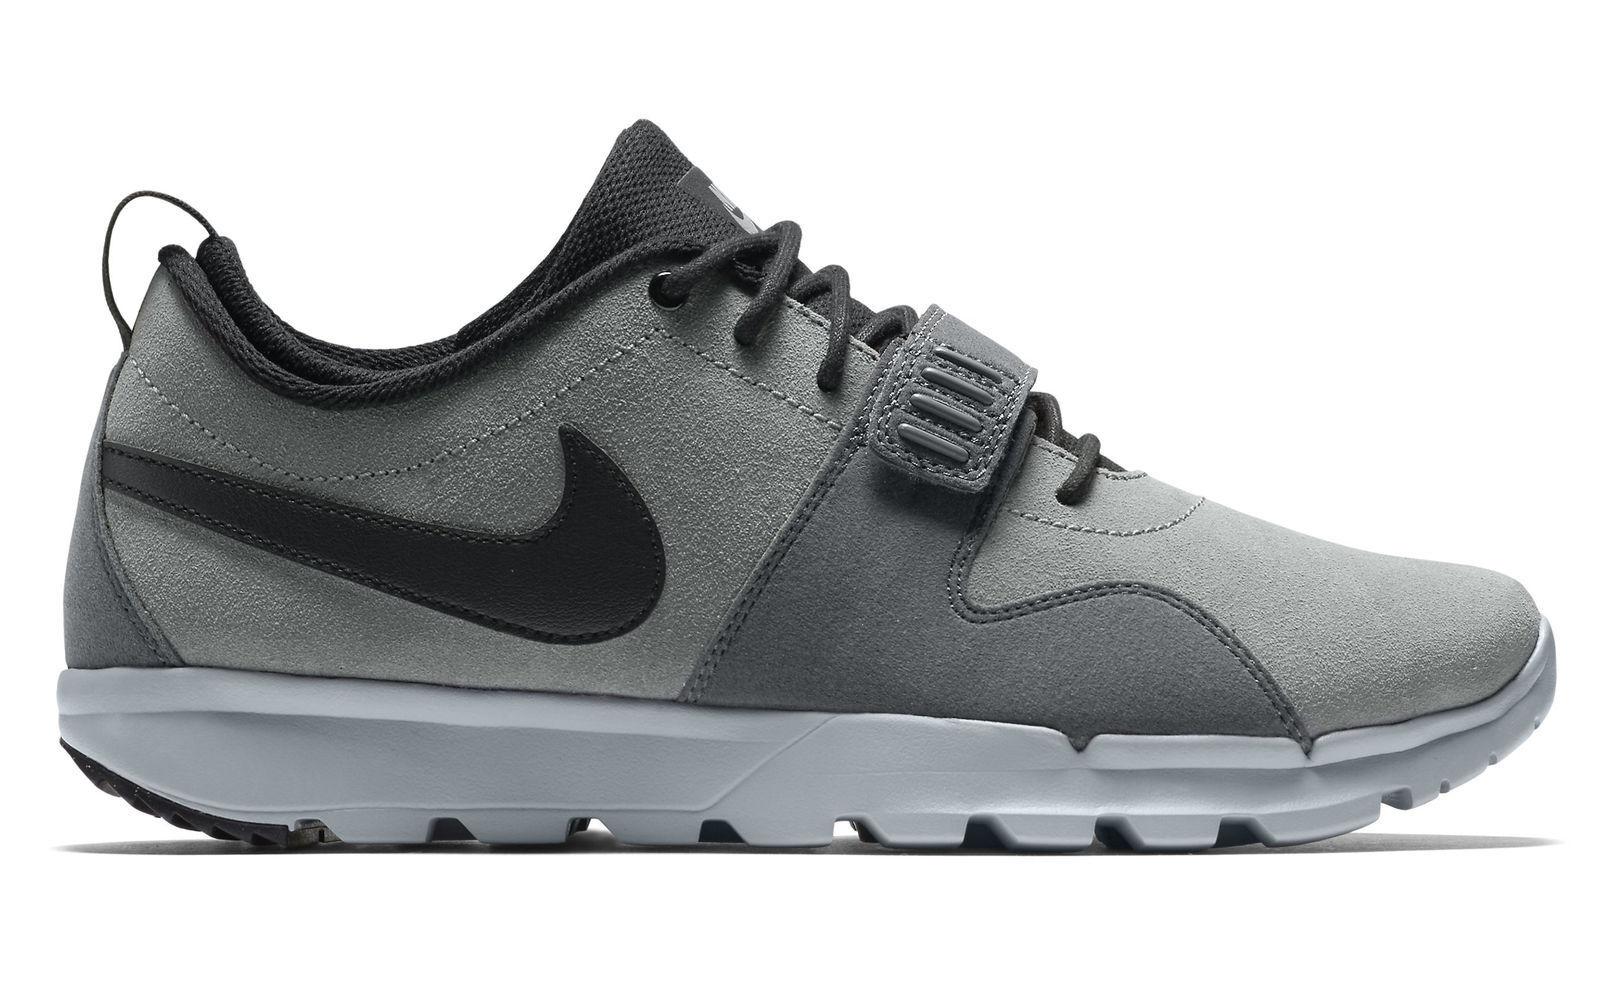 9533c39b8e Nike SB Air Trainer 1 Mid Strap Men's Shoes, Size 8 - Cargo Khaki .